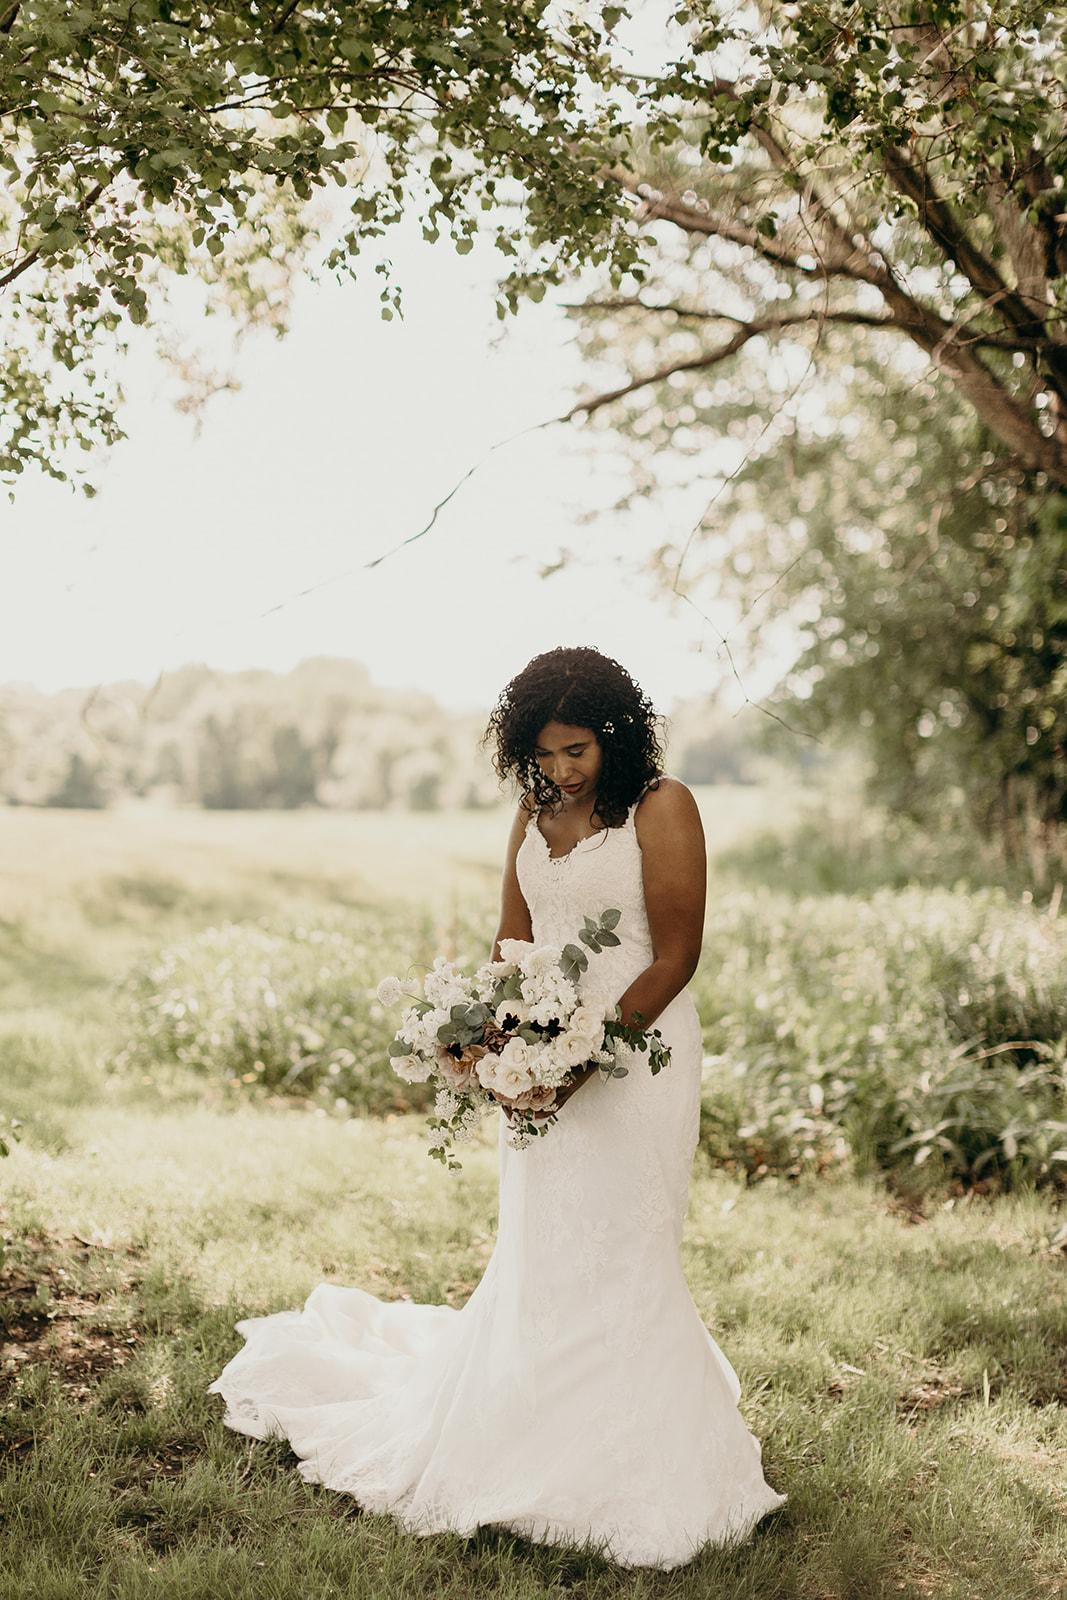 Photo: Sarah Ascanio Photography